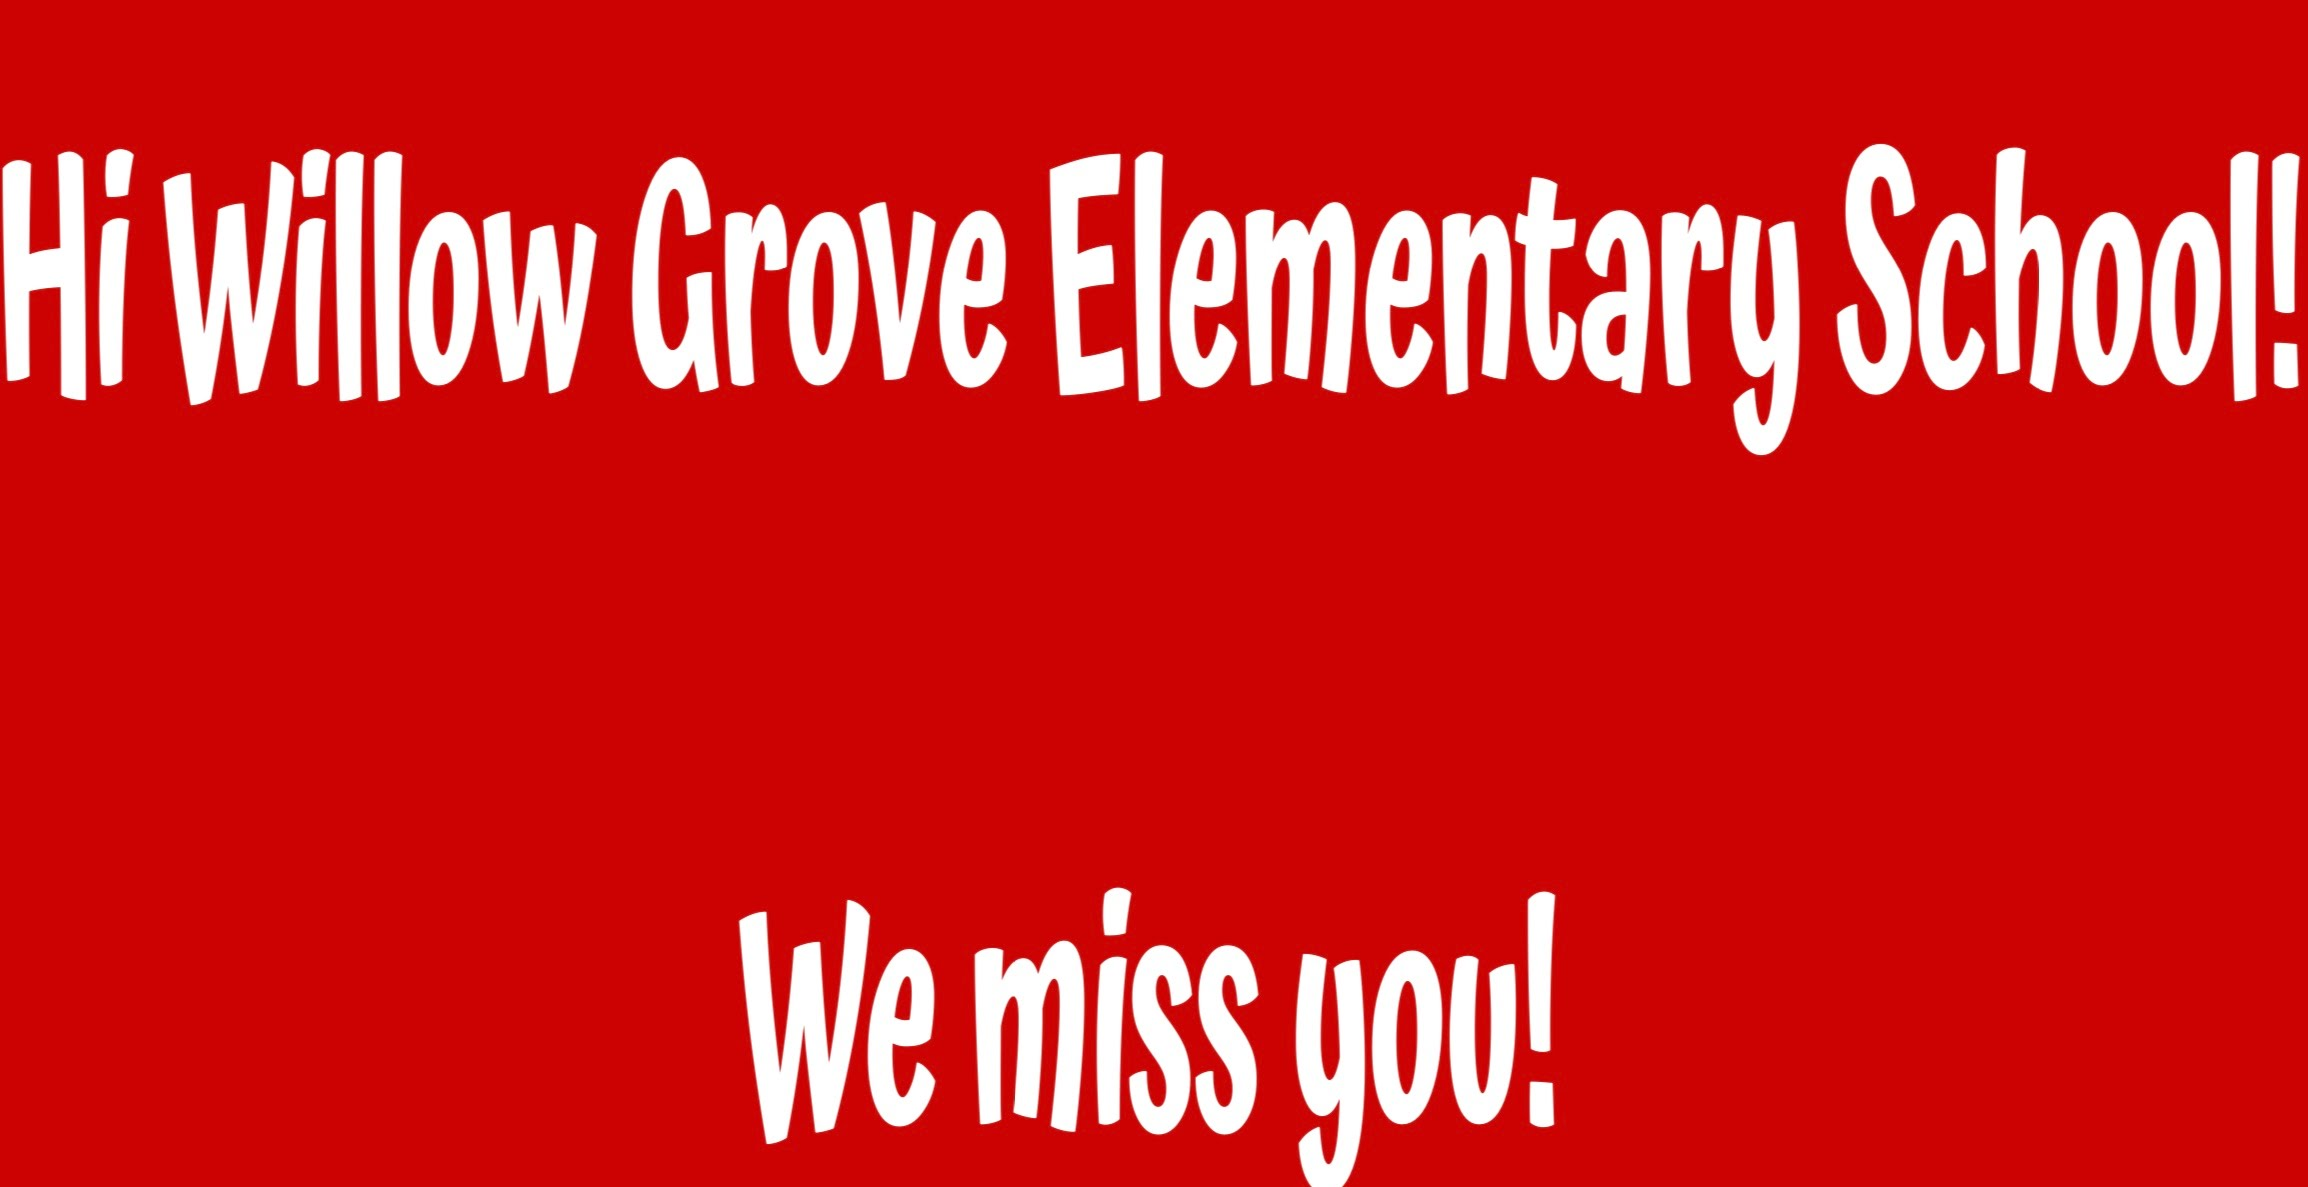 Hi Willow Grove Elementary School